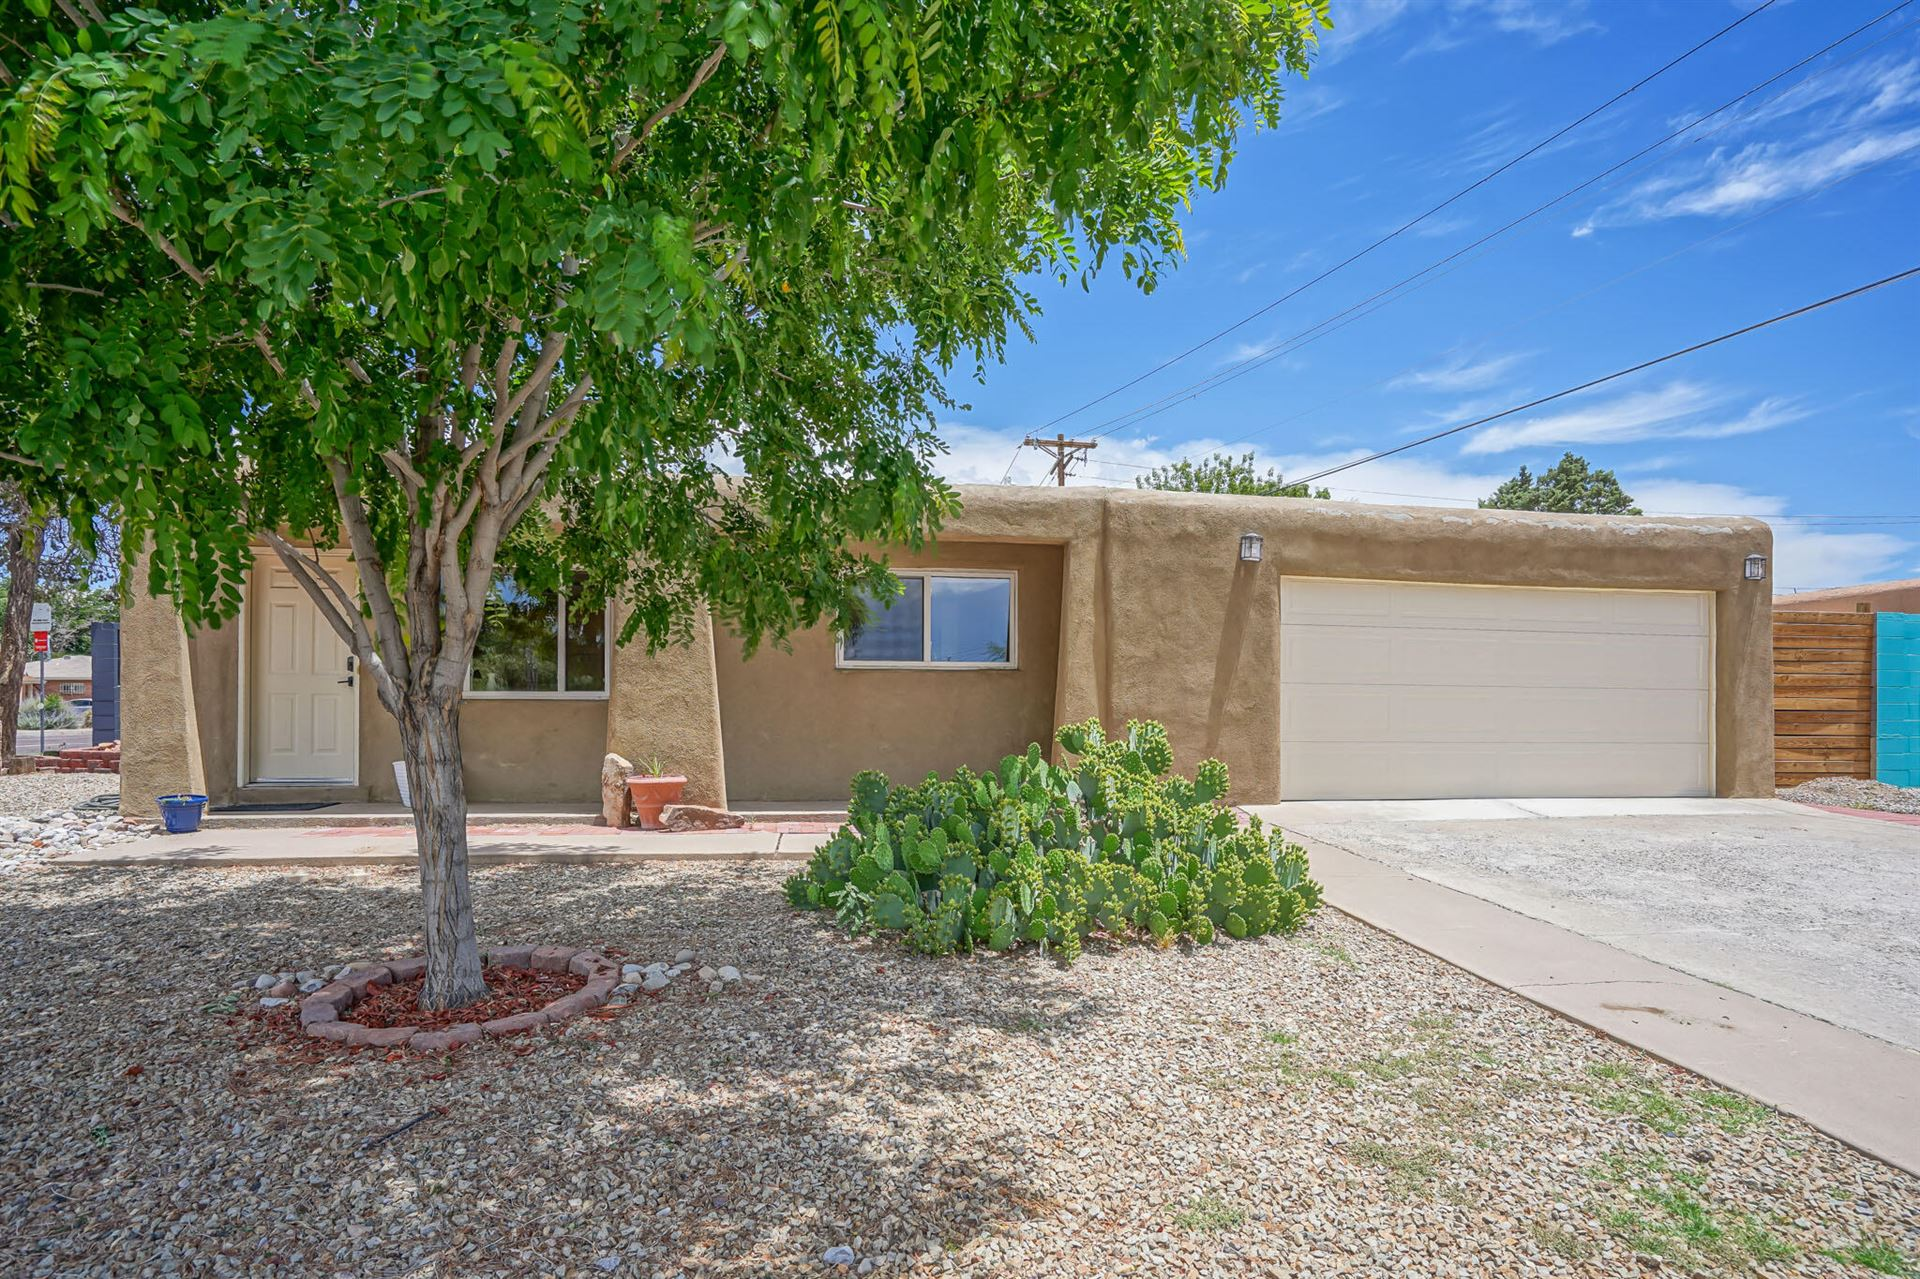 Photo of 1732 HOFFMAN Drive NE, Albuquerque, NM 87110 (MLS # 994518)